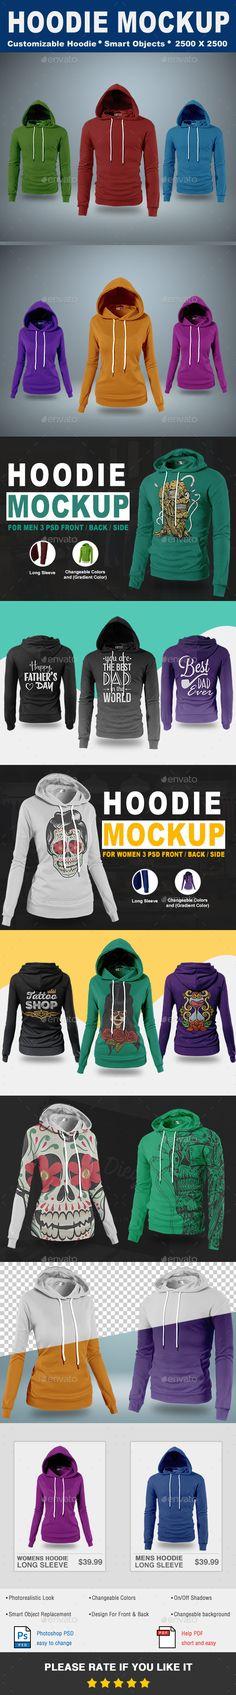 Hoodie #Mock-Up Vol.1 - #T-shirts #Apparel Download here: https://graphicriver.net/item/hoodie-mockup-vol1/20182097?ref=alena994